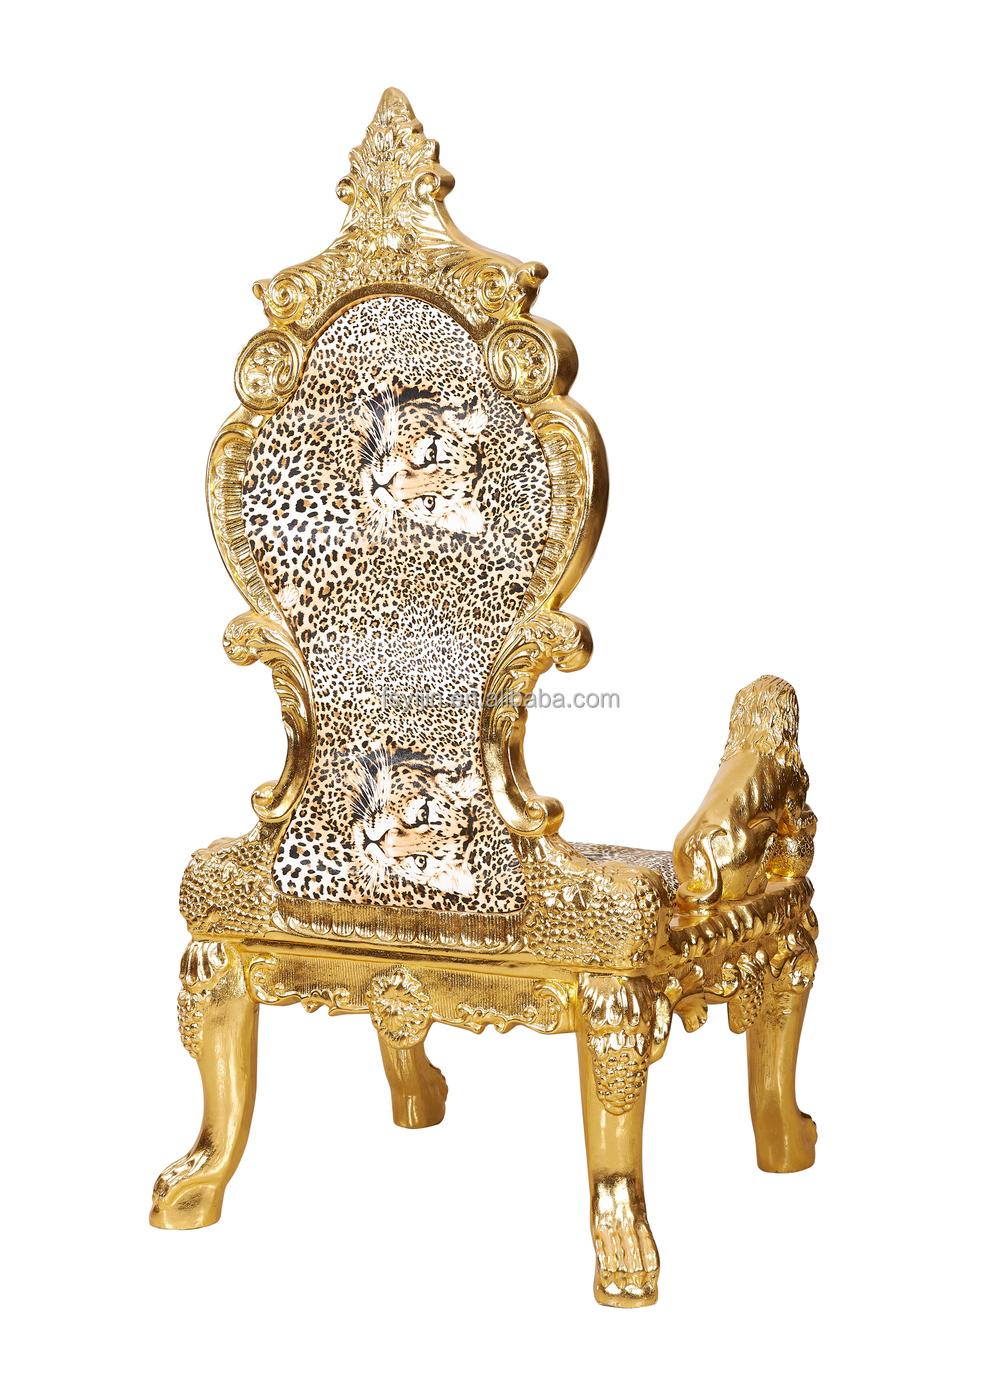 Nieuwe ontwerp goud troon stoelen te koop hotel stoelen product id ...